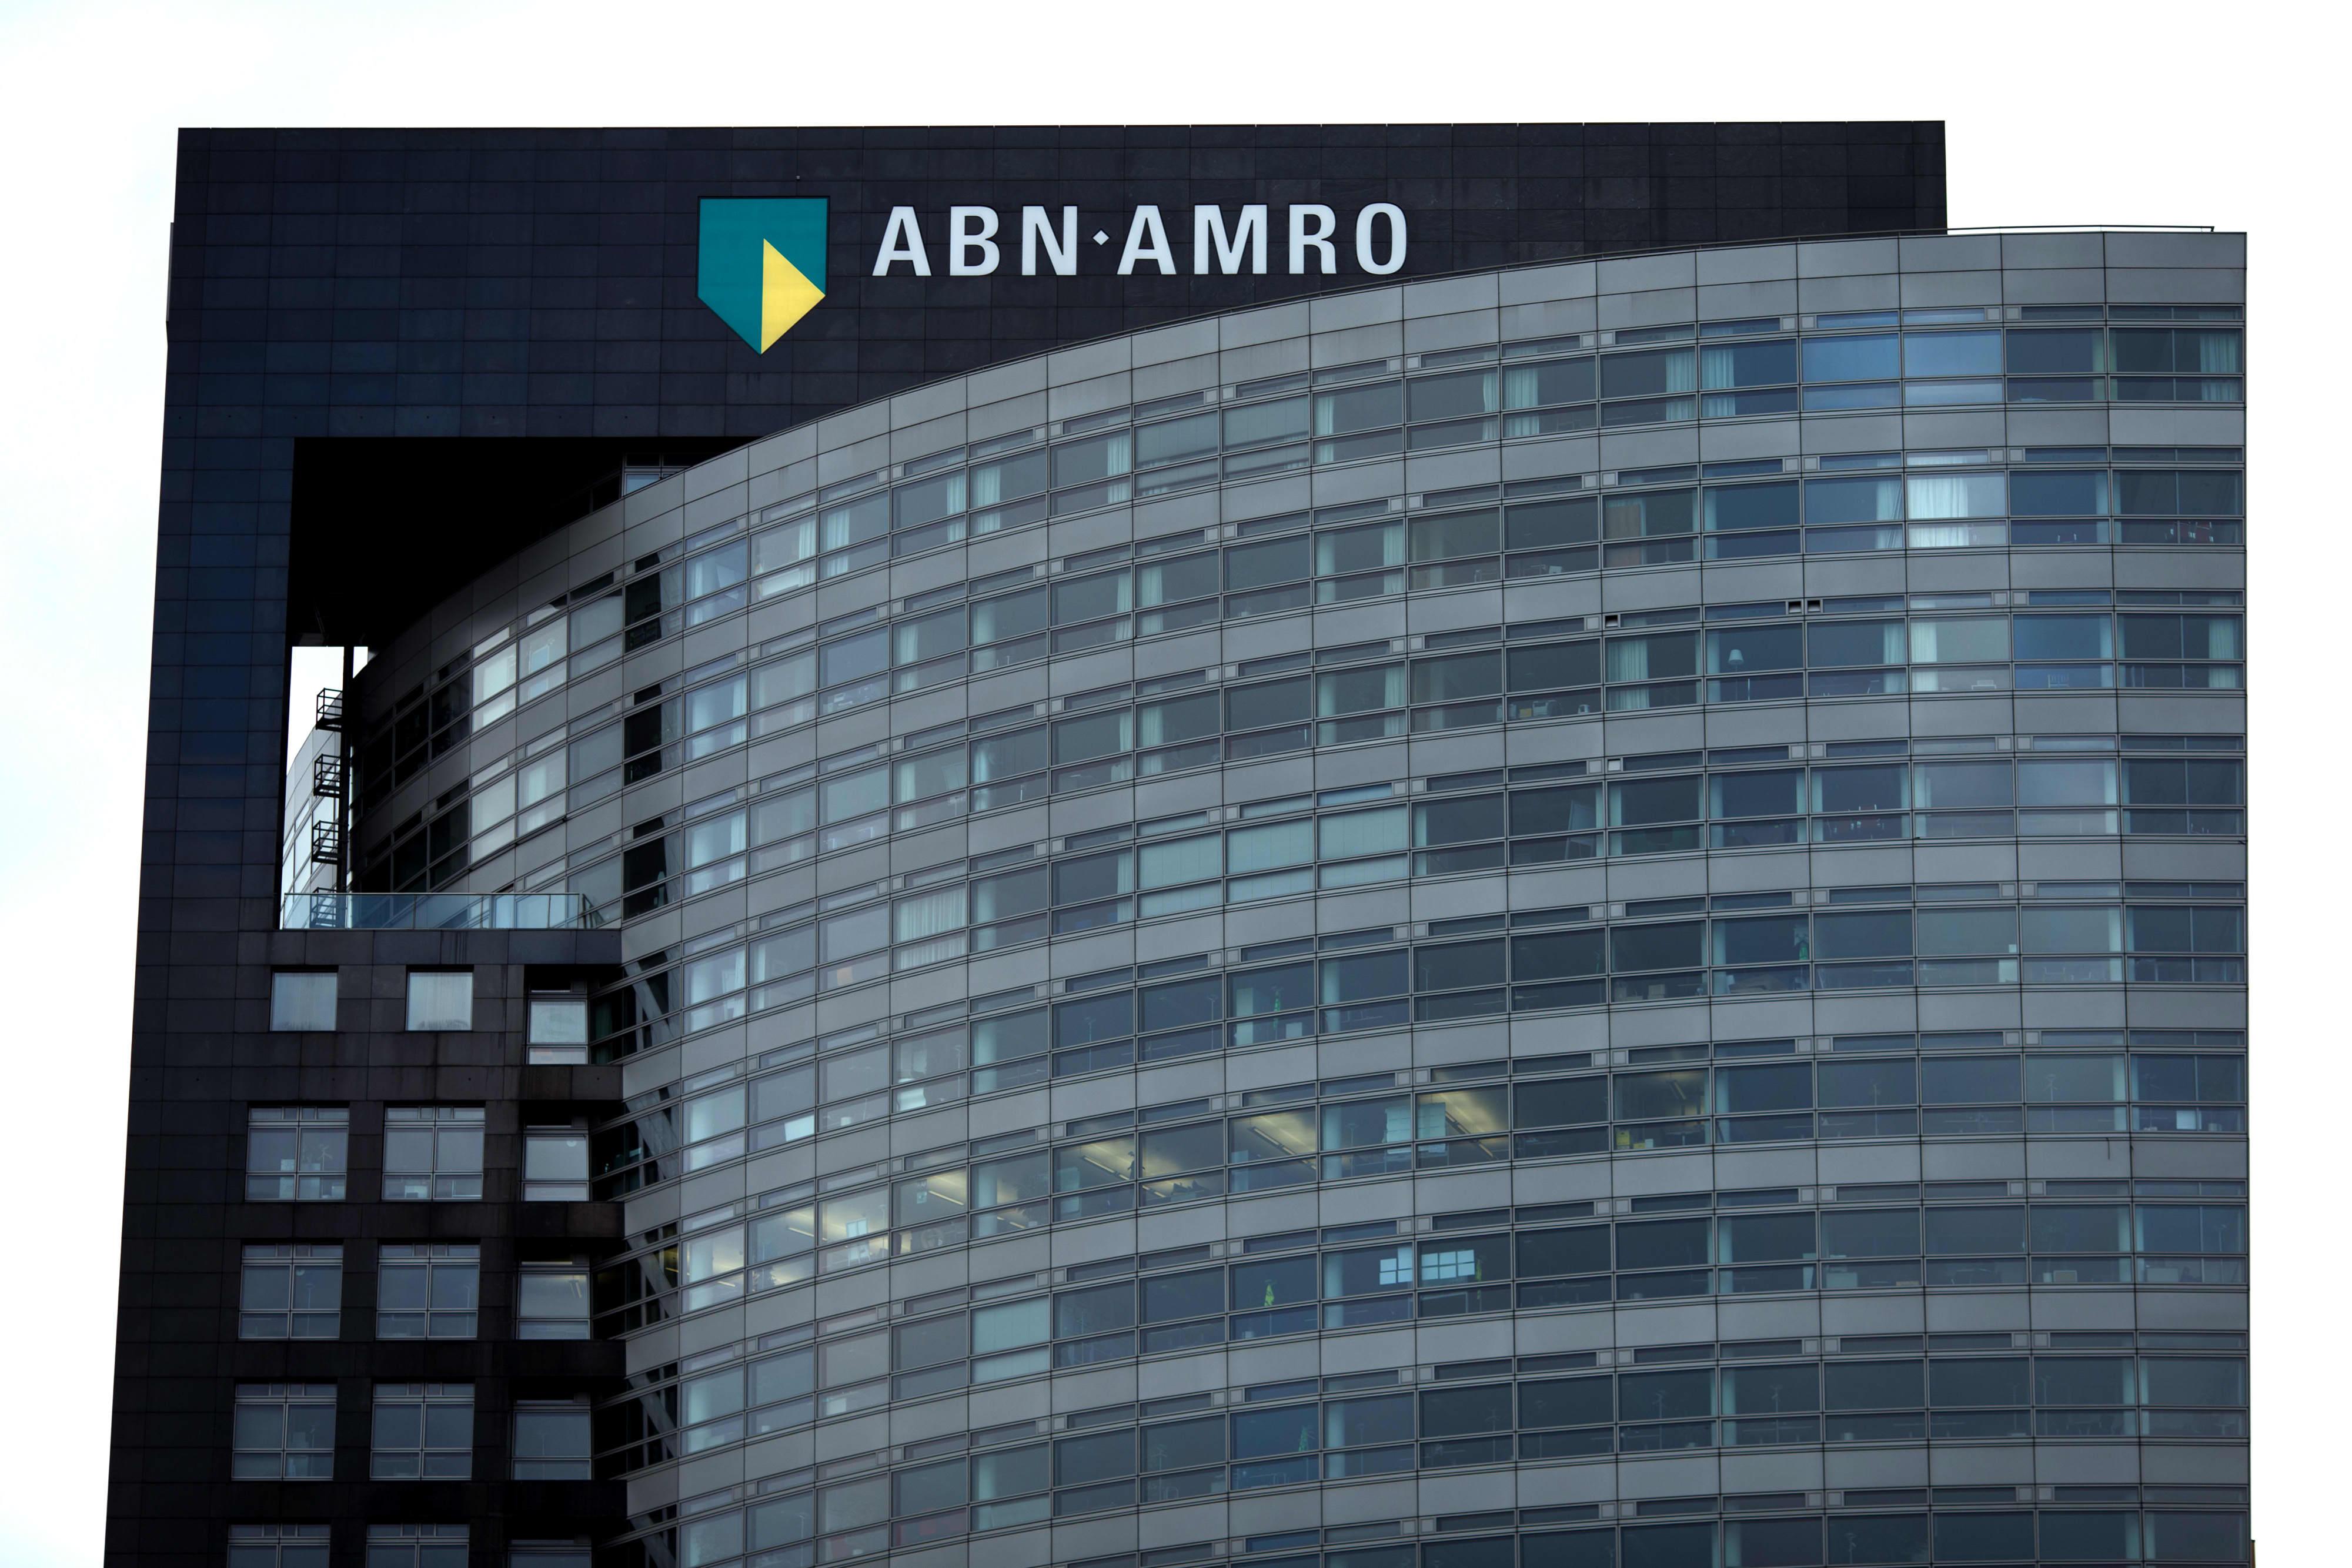 Dutch bank ABN Amro resumes dividend payments as Q2 net profit beats